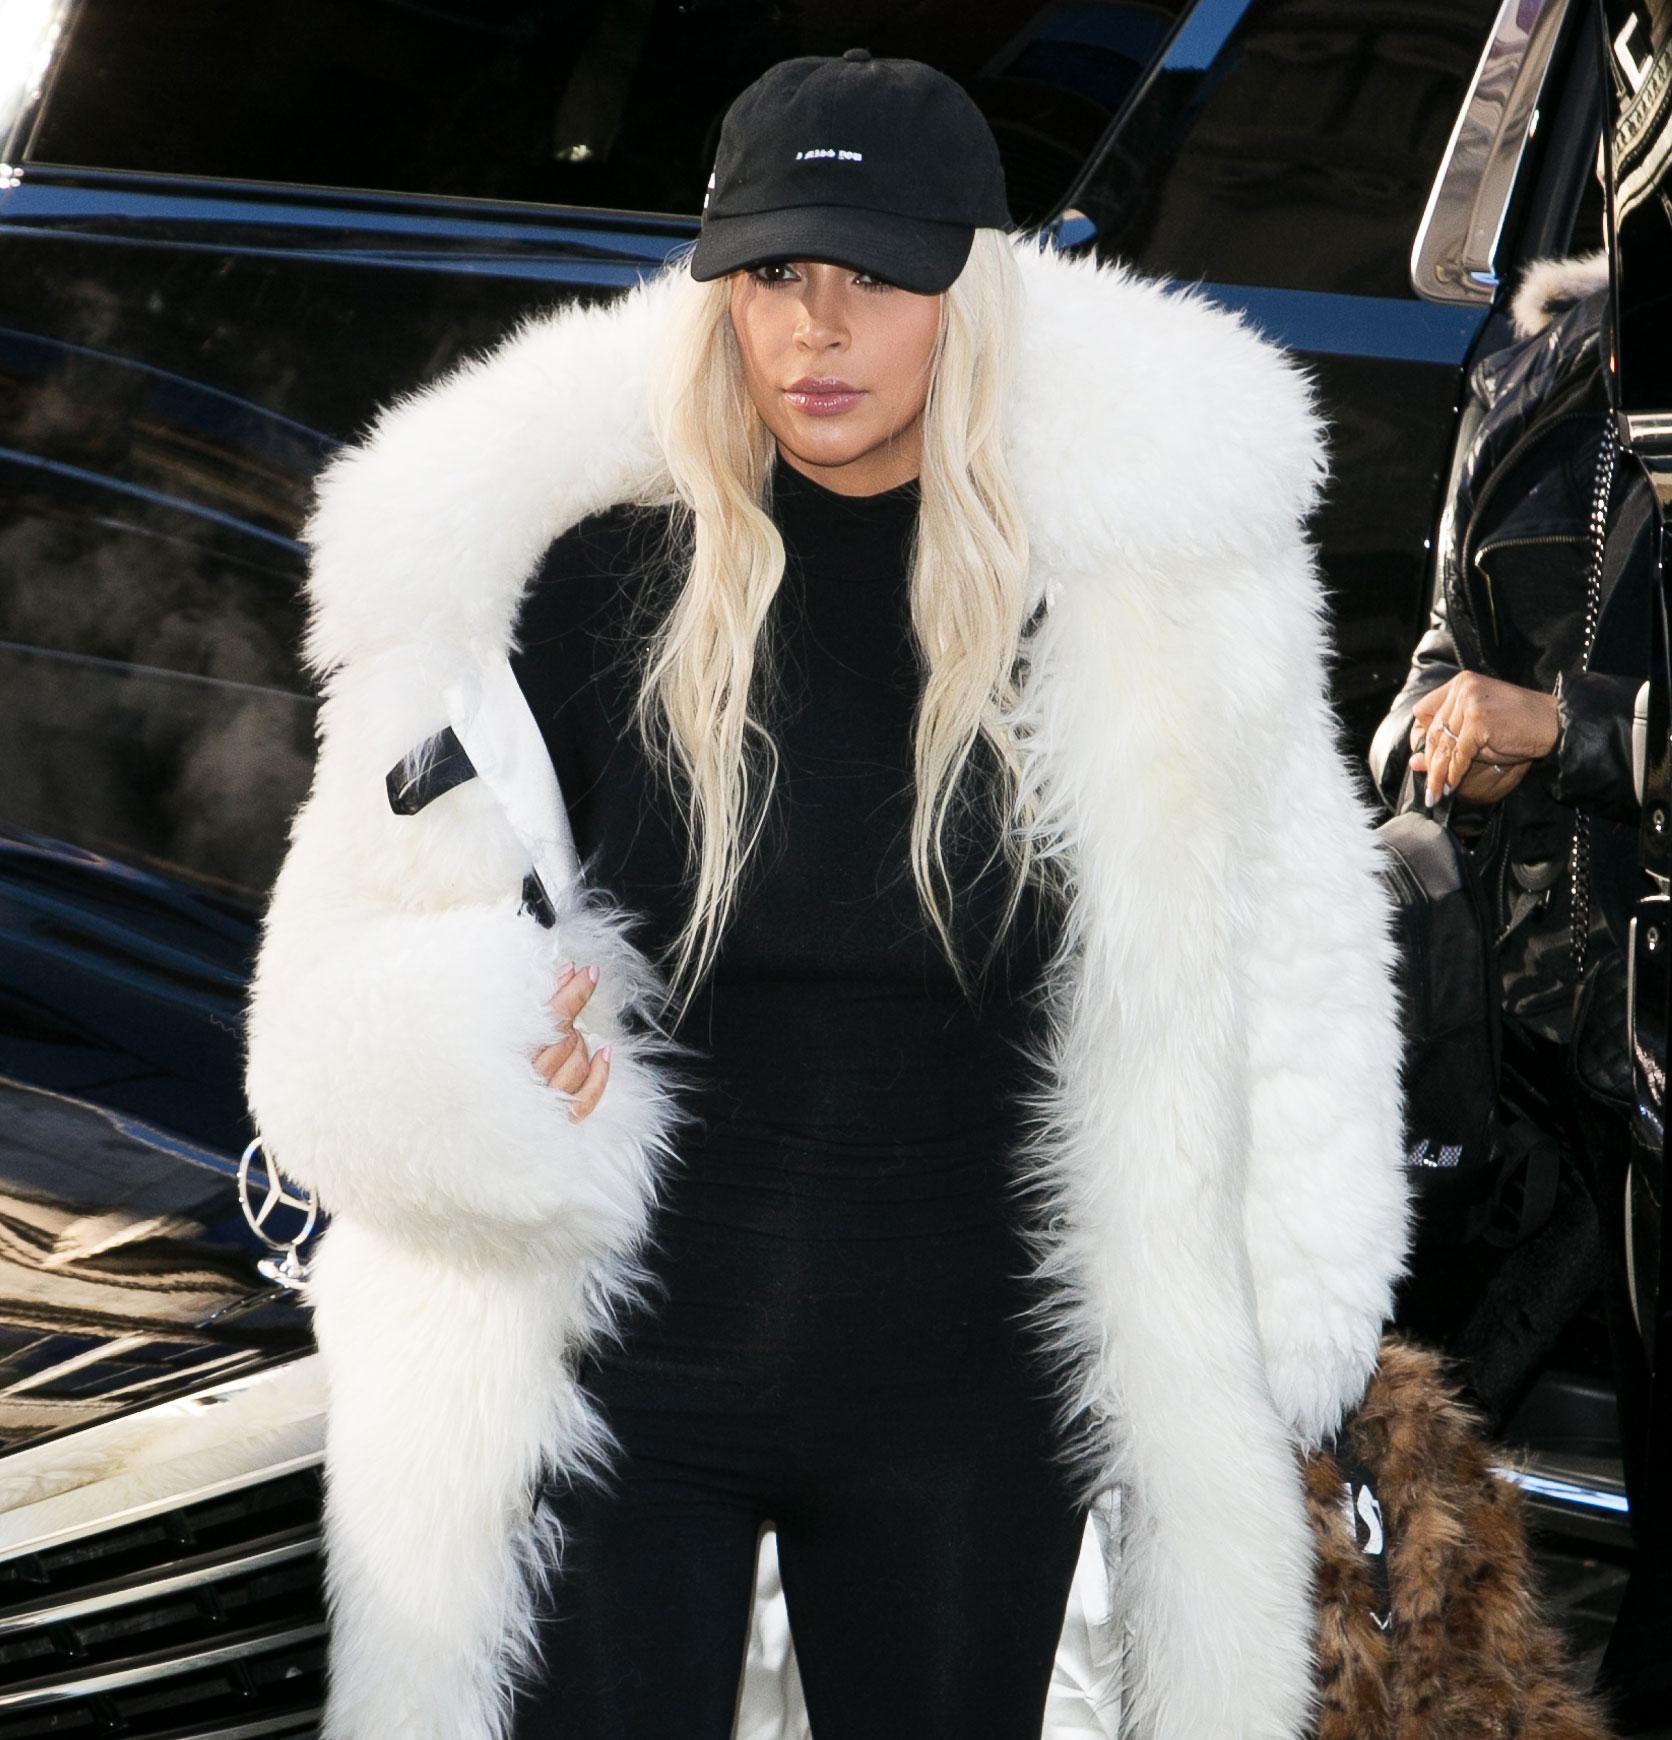 Kim Kardashian White Fur Coat - Kim Kardashian West on February 14, 2016 in New York City.